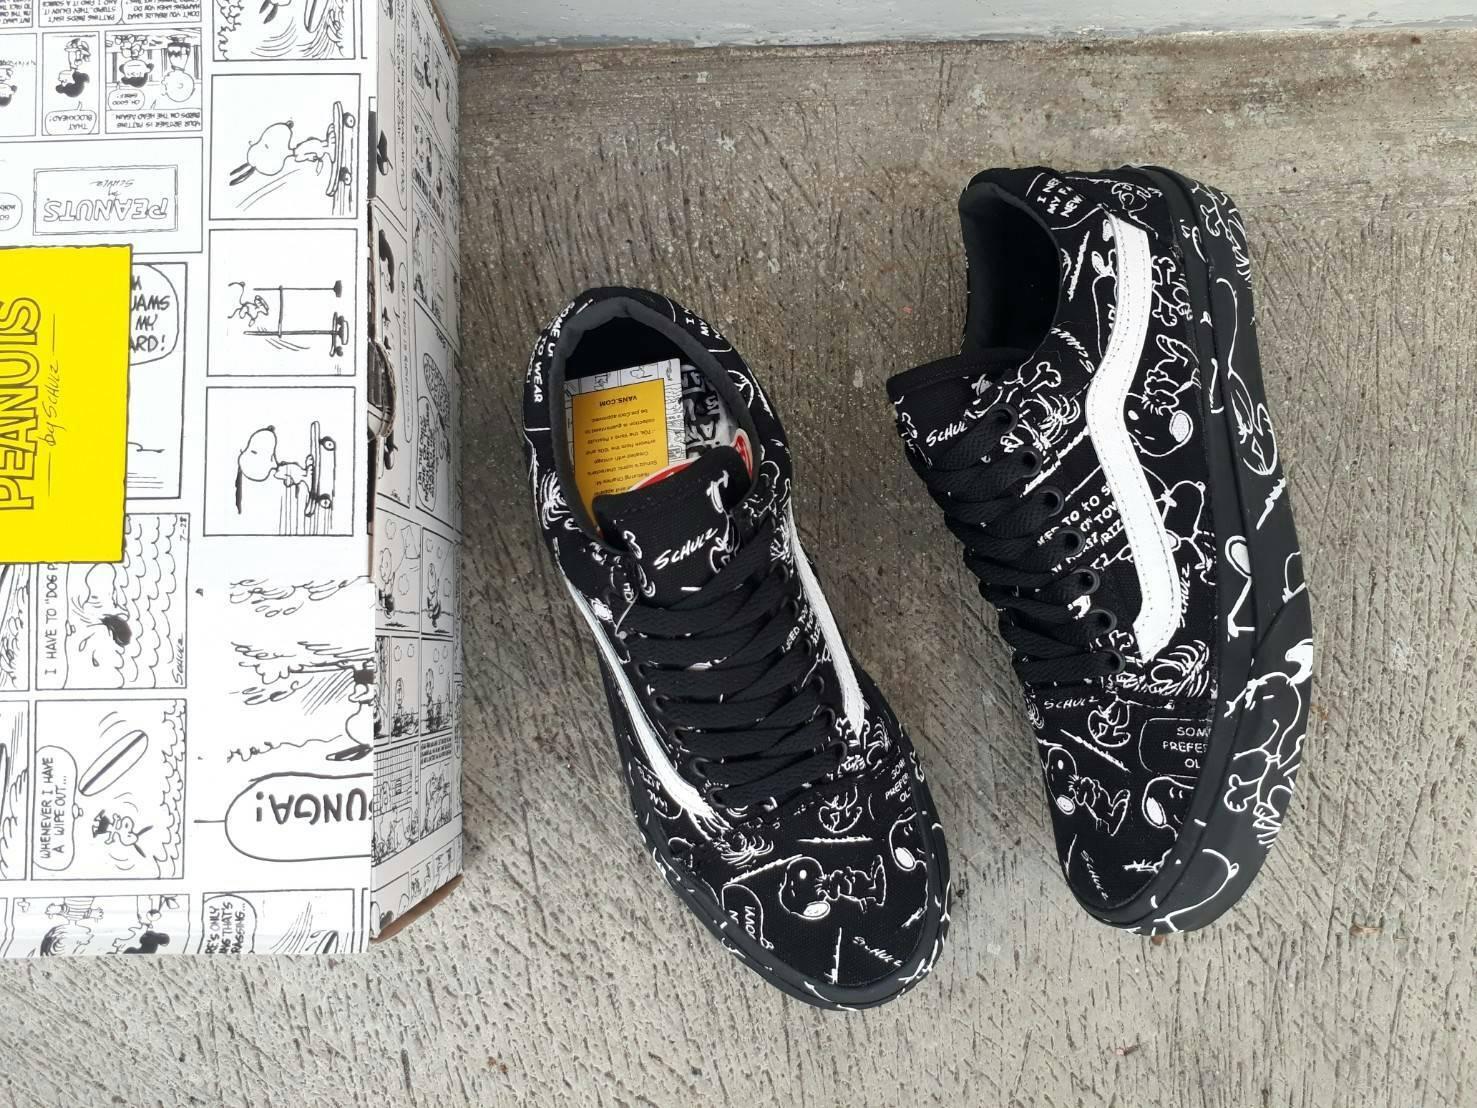 895c87d376 sepatu pria vans old skool (PEANUTS) snoopy black waffle ICC premium BNIB  made